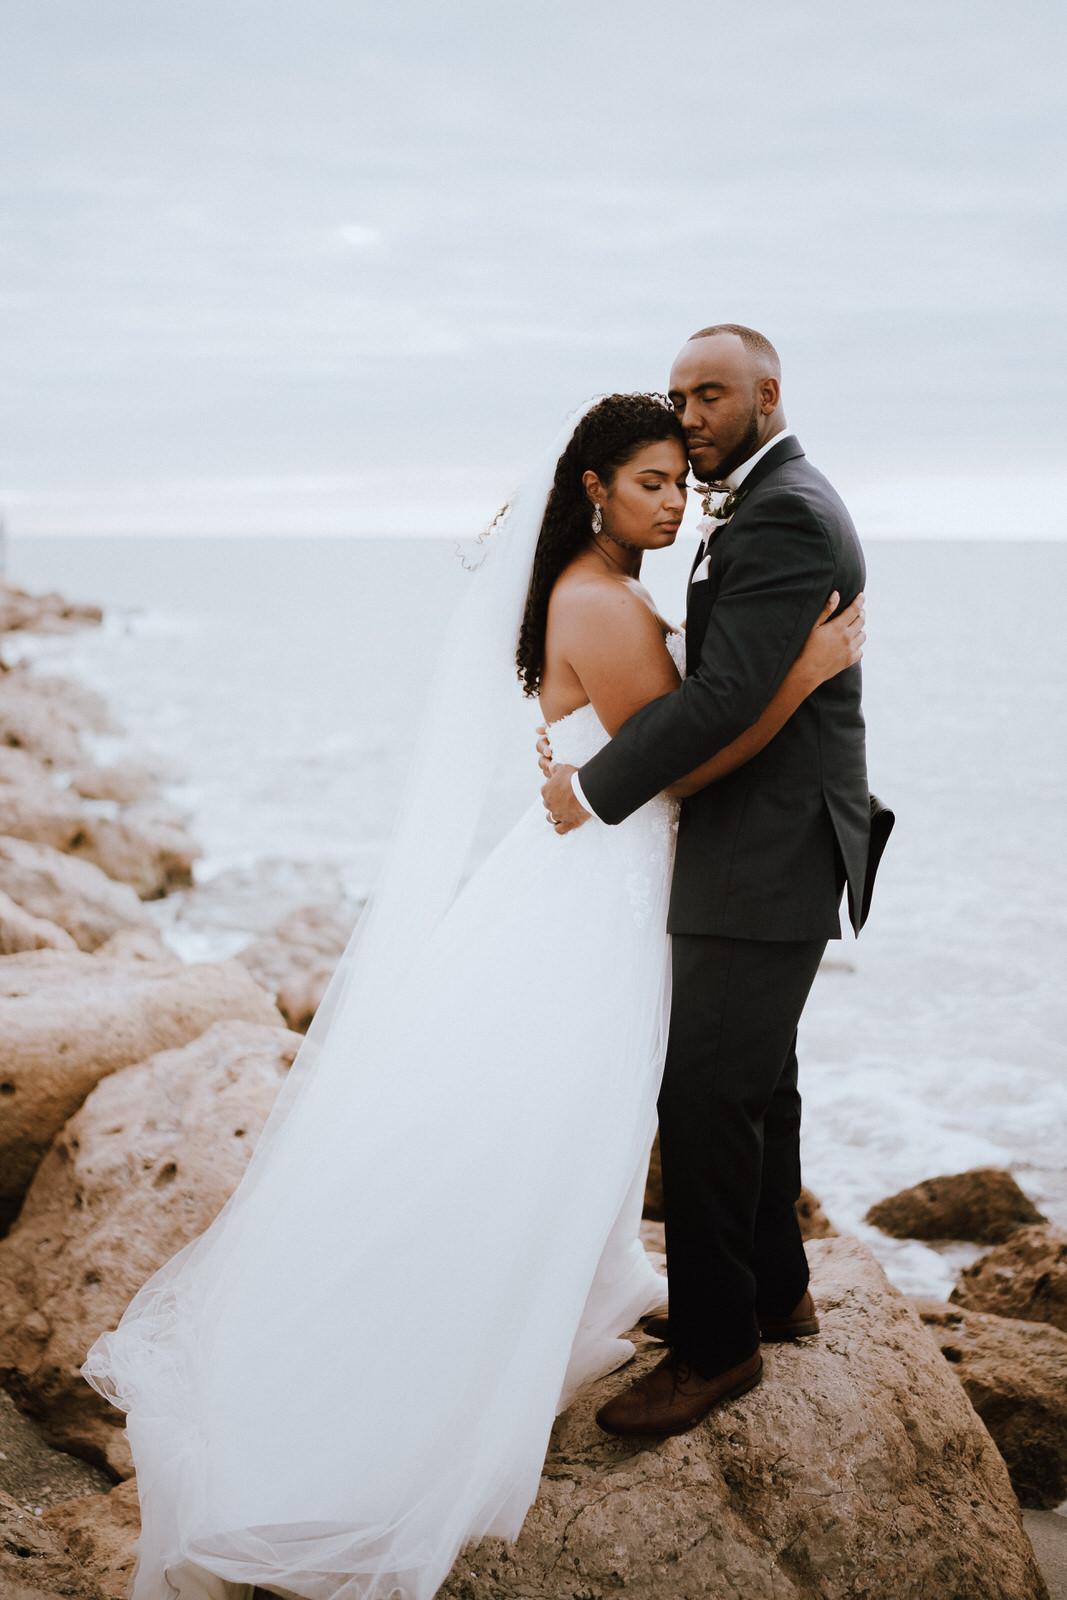 South Seas Island Resort Elopement- Alyana and Shawn- Michelle Gonzalez Photography-554.JPG